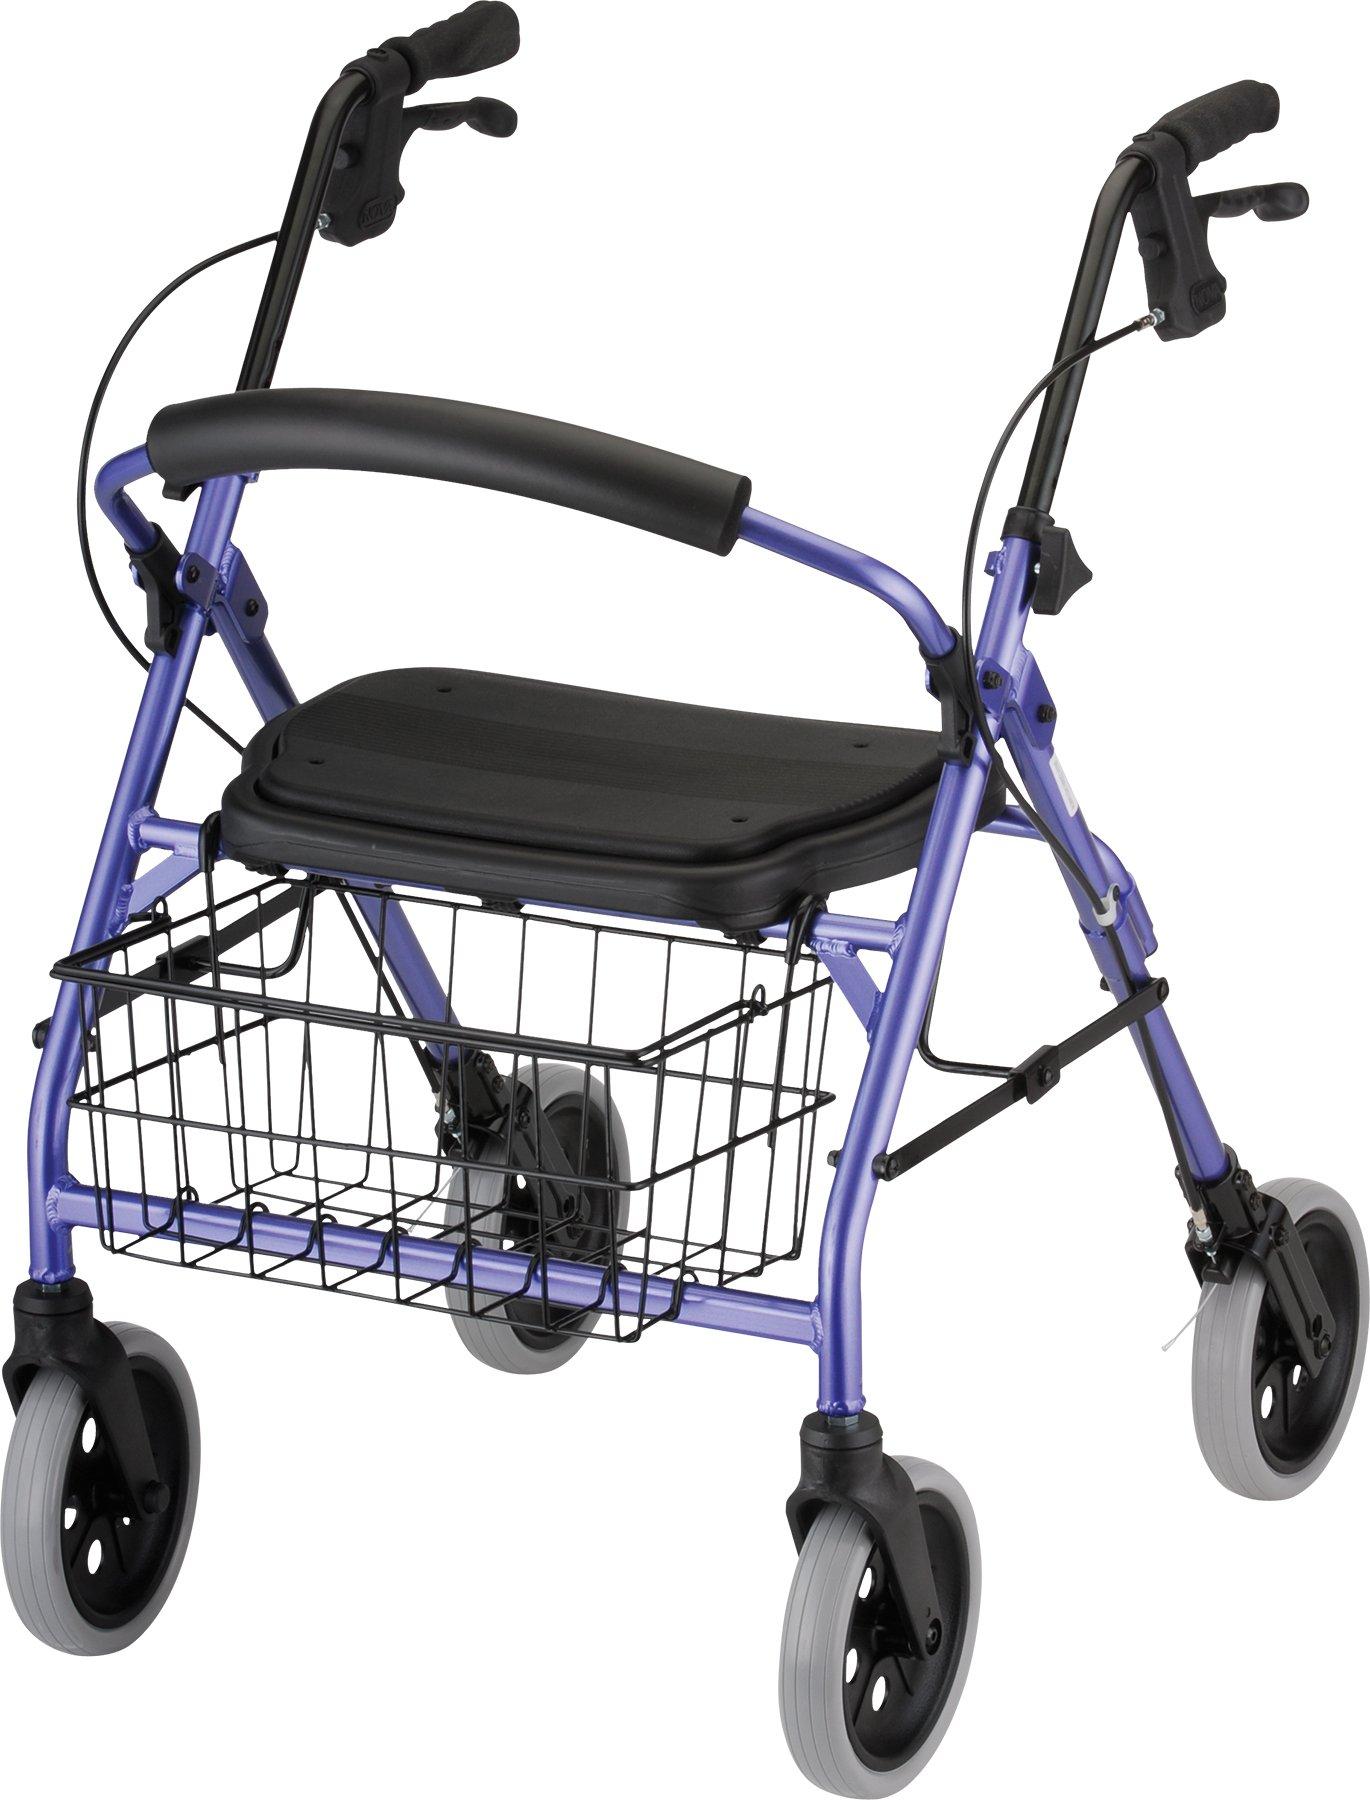 NOVA Medical Products Cruiser Deluxe Walker, Purple